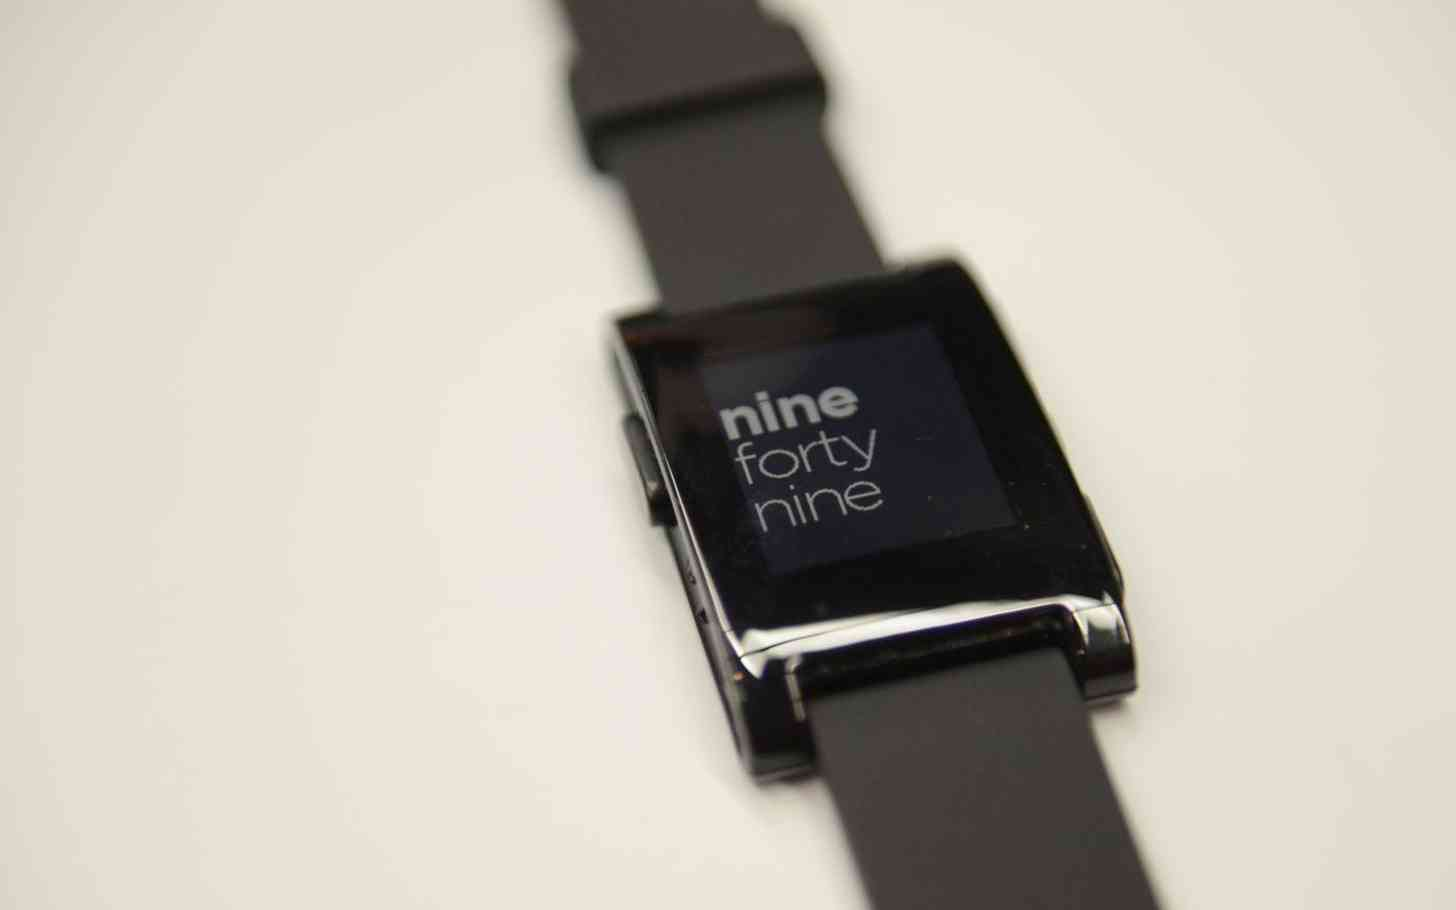 Pebble smartwatch hands-on